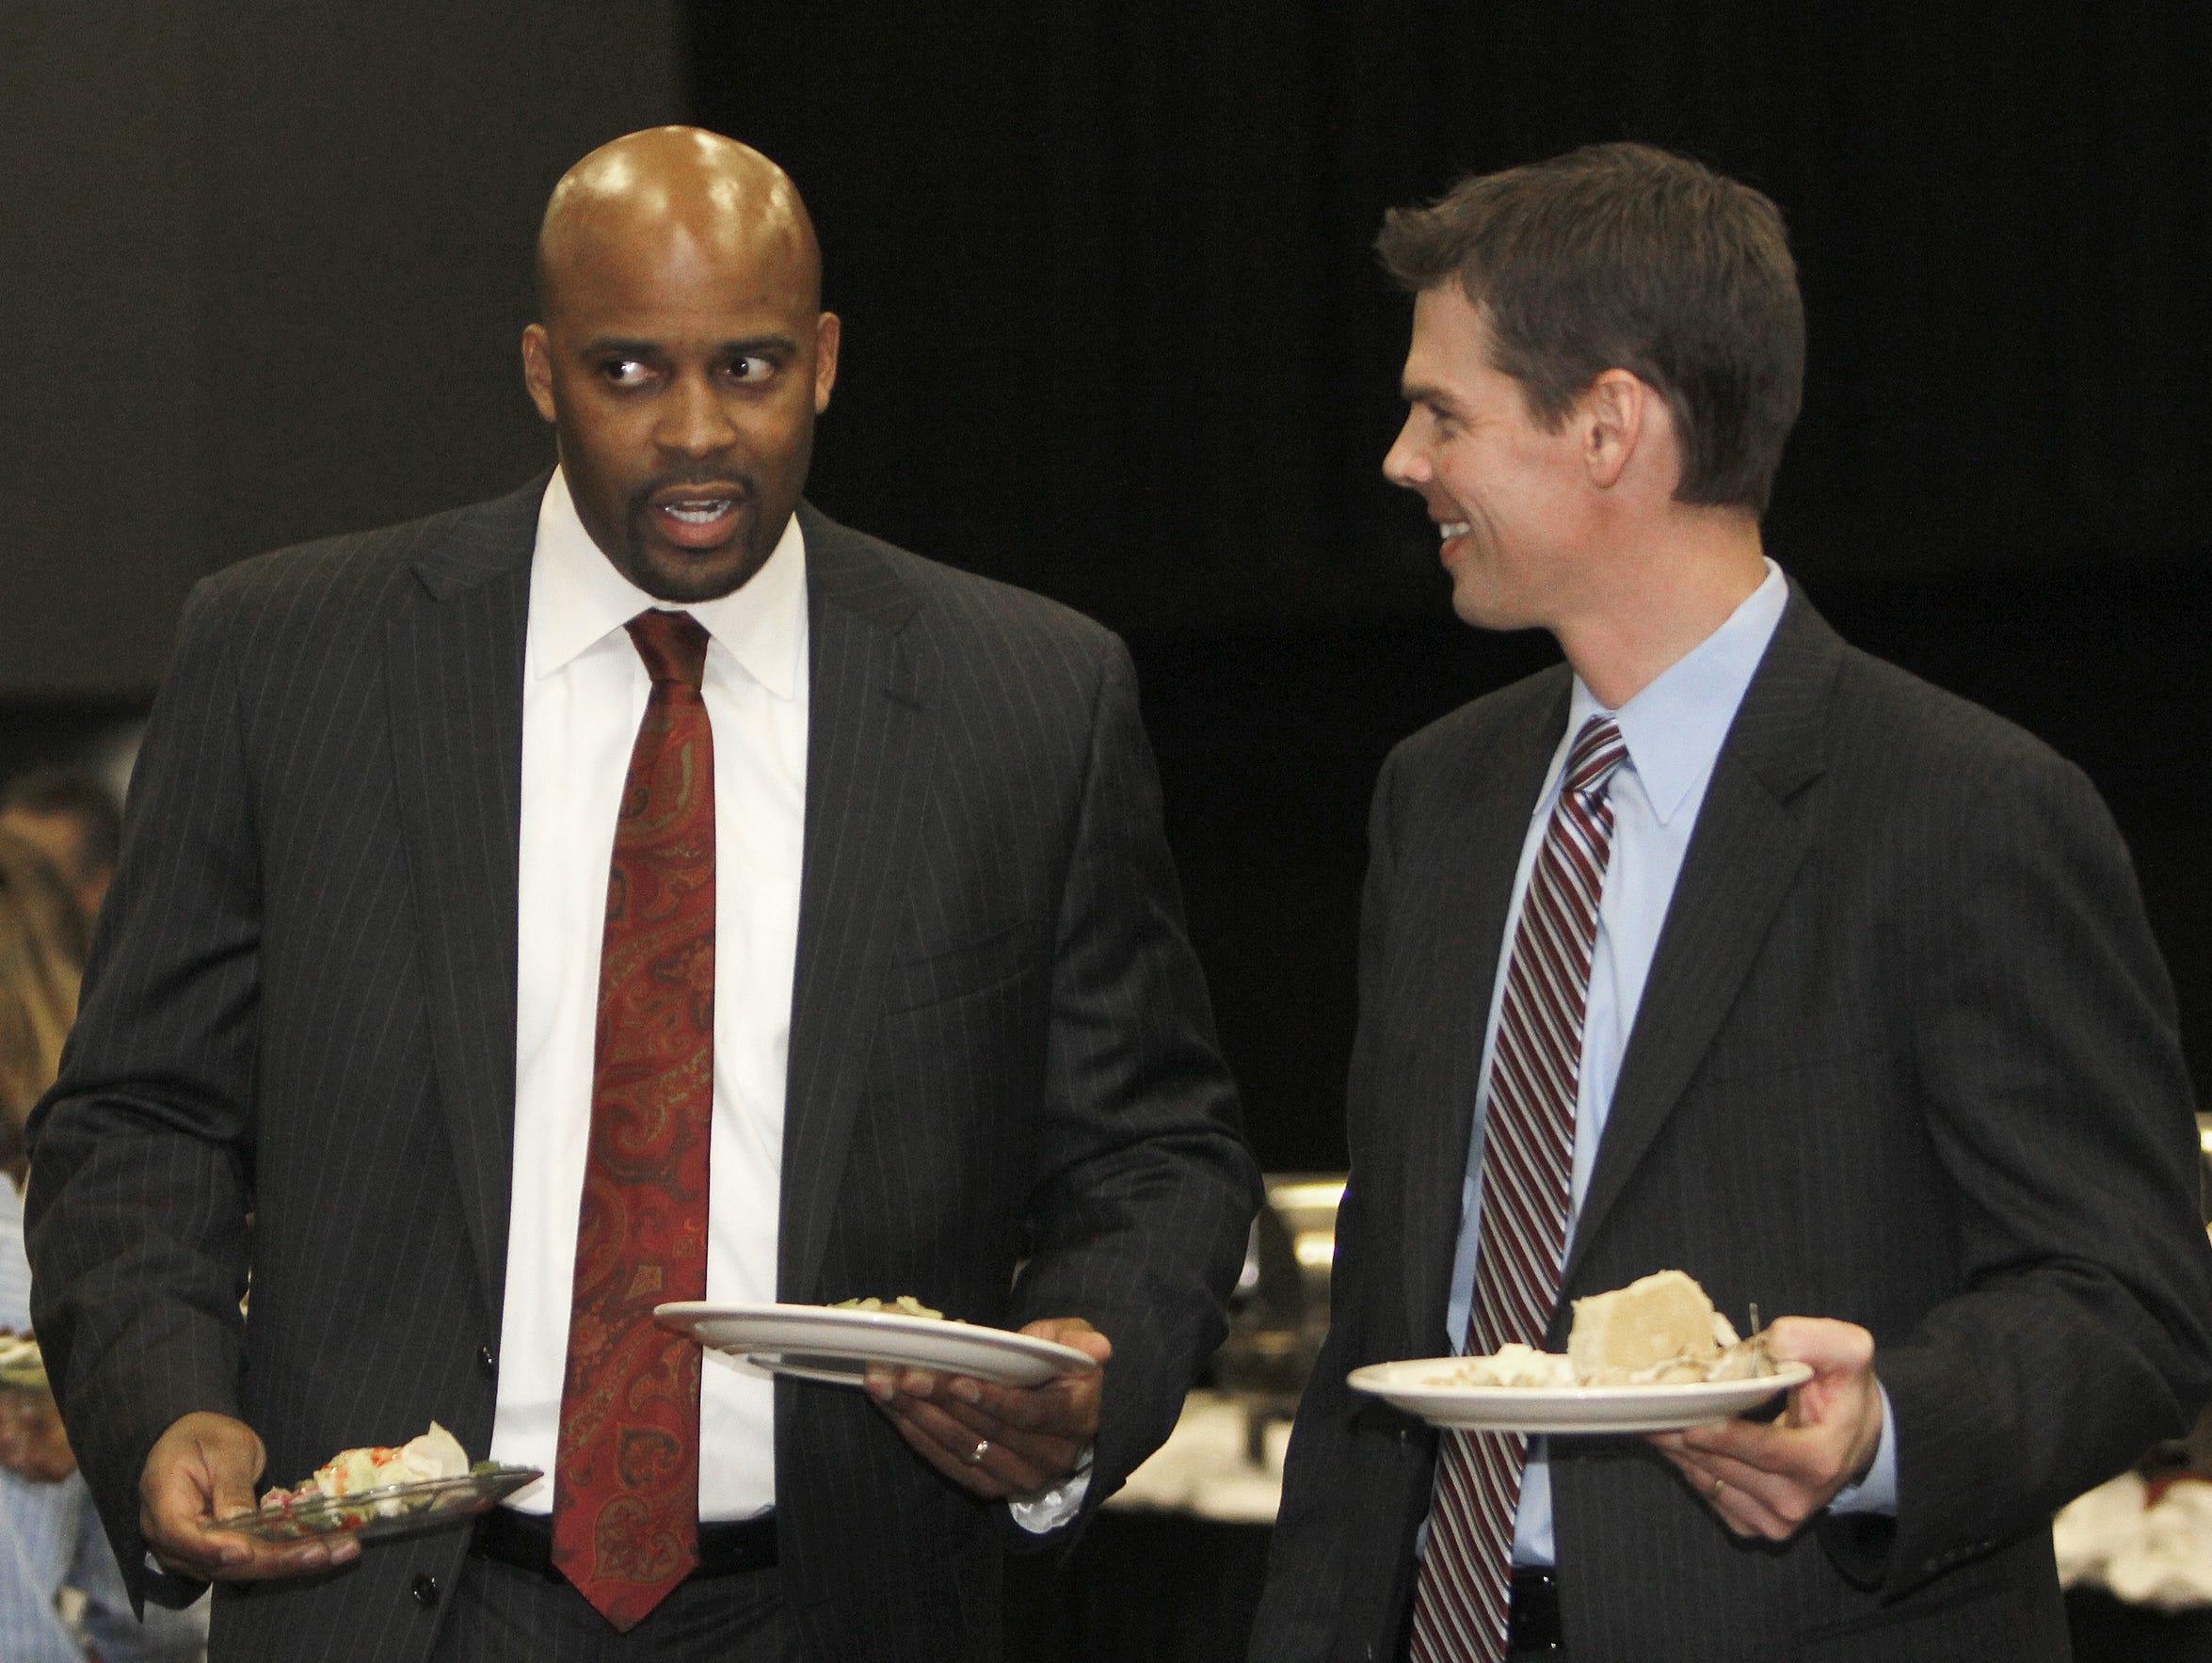 2011 flashback: Former head coach Cuonzo Martin talks